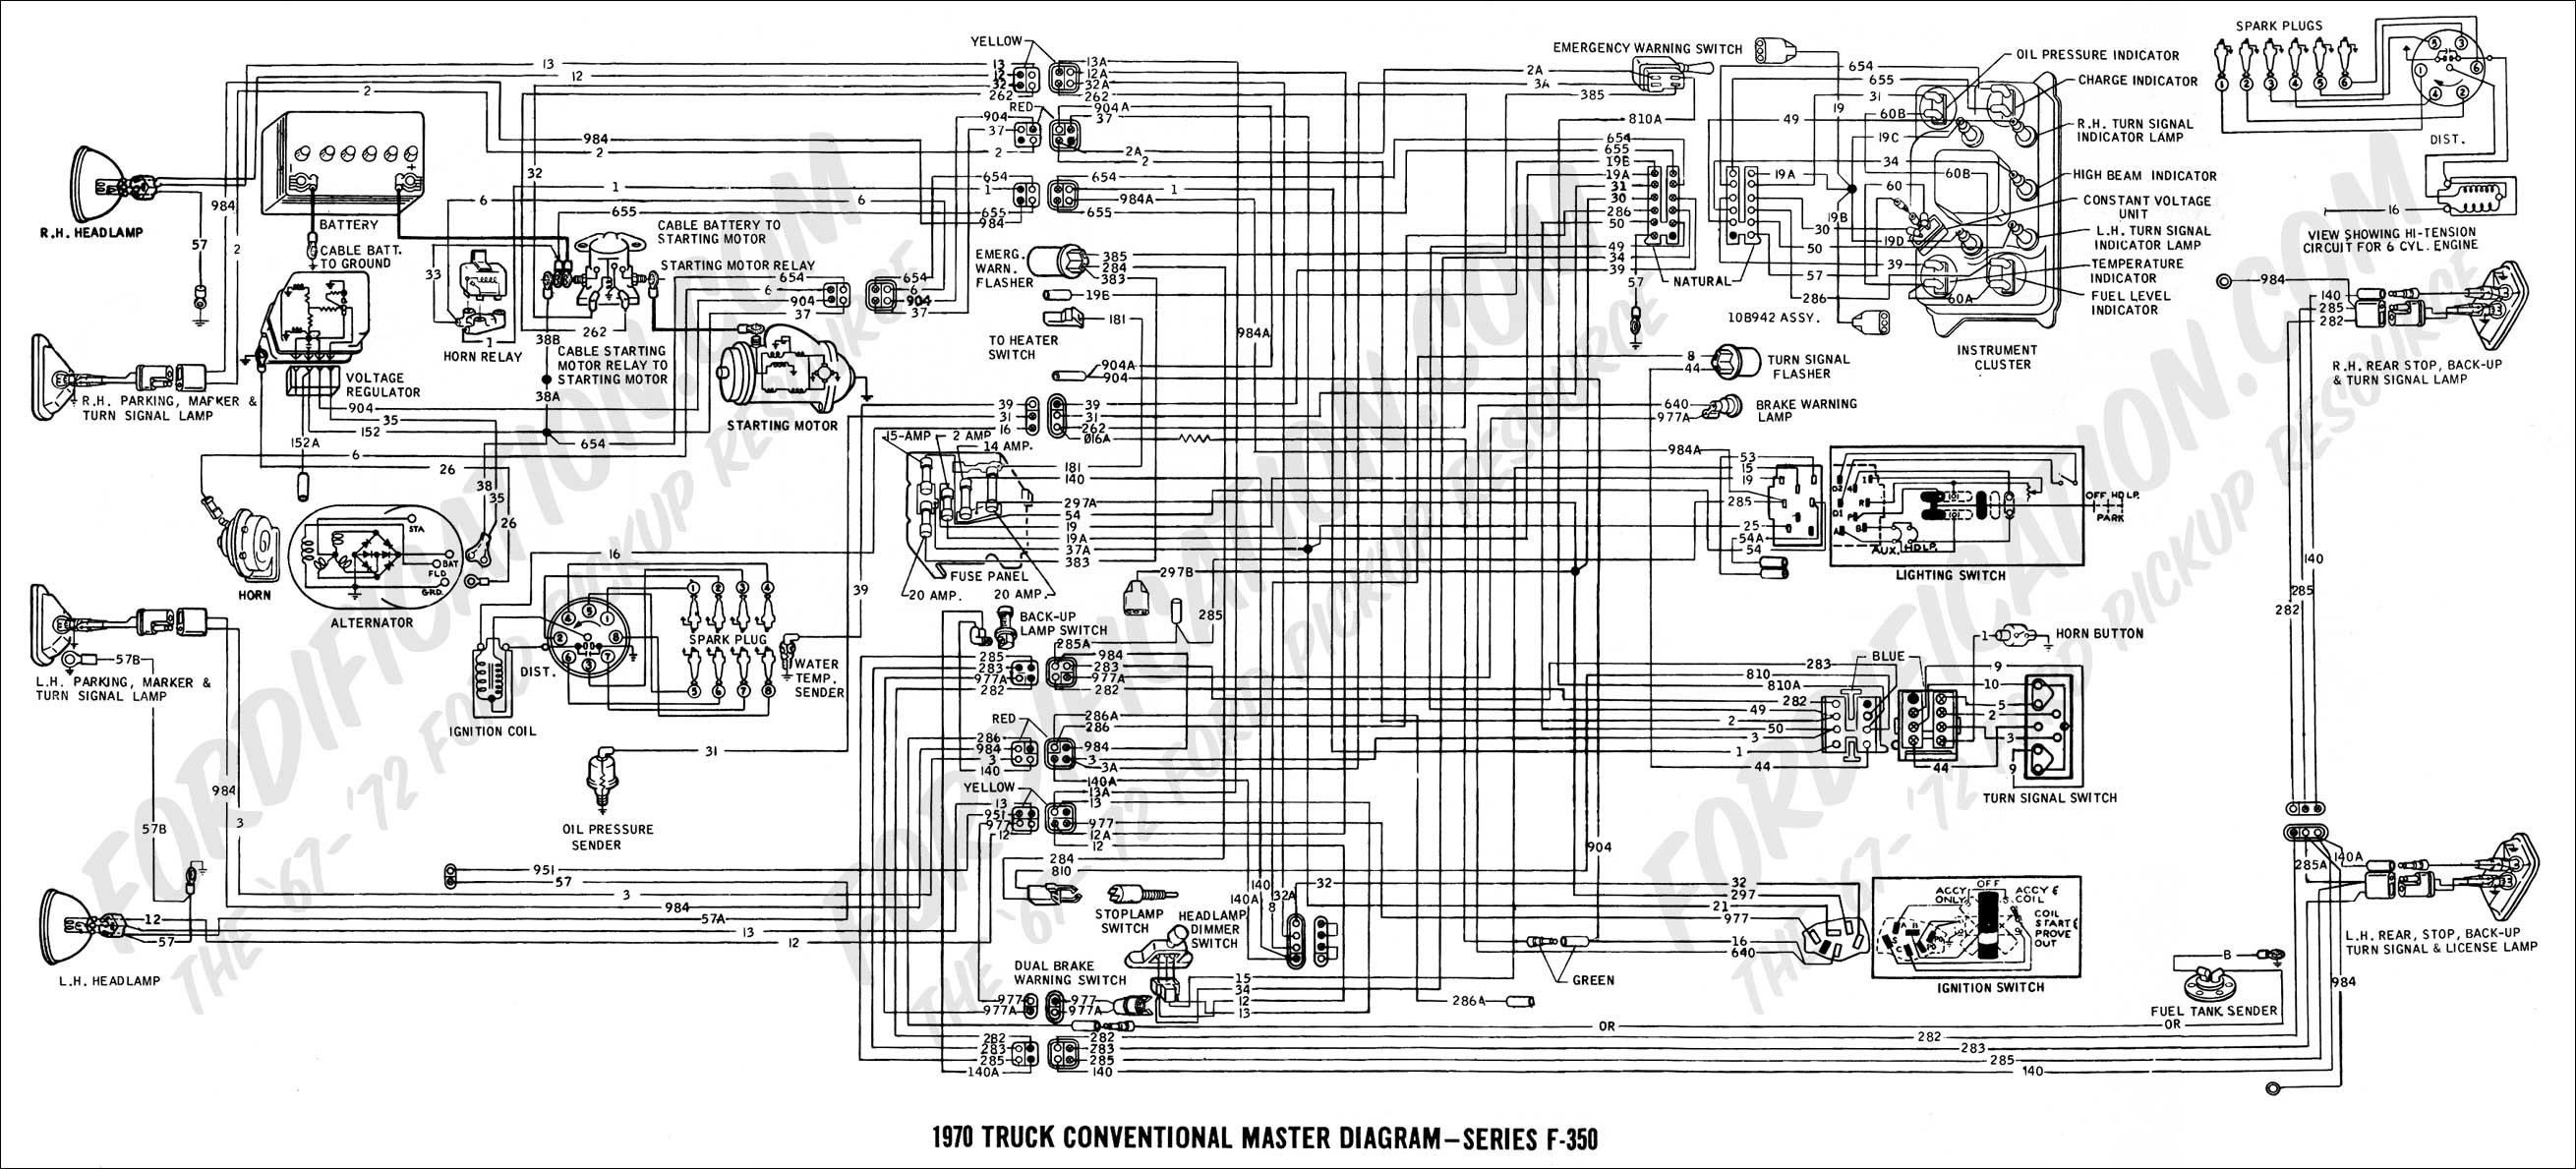 2011 ford F150 Radio Wiring Diagram Diagram as Well ford F 350 Wiring Diagram In Addition ford Headlight Of 2011 ford F150 Radio Wiring Diagram